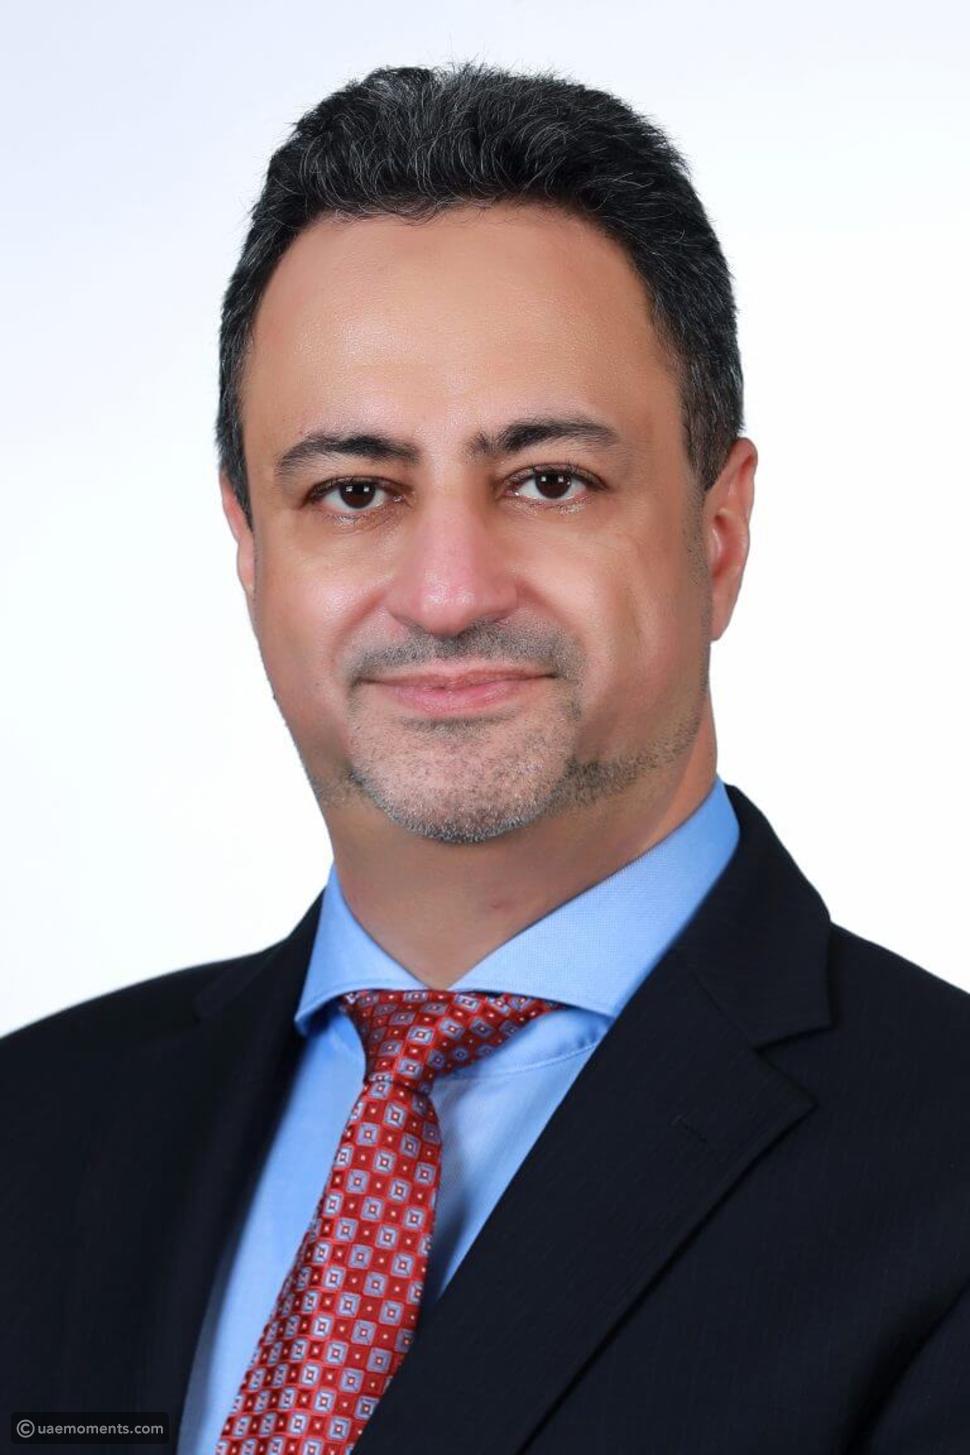 UAE Professor Talks About Receiving the Emirati Citizenship